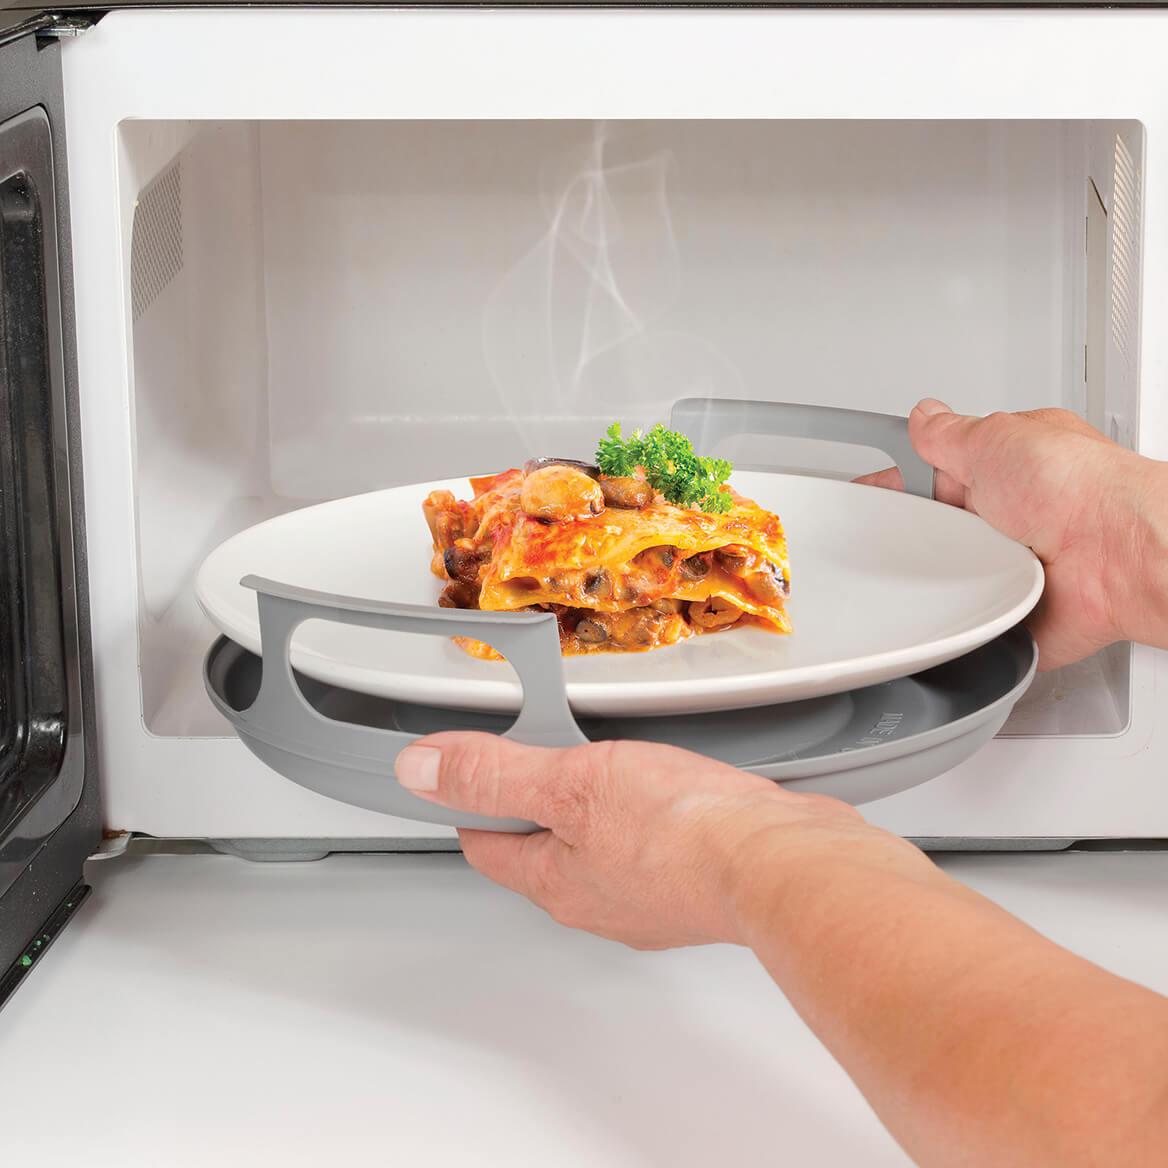 Microwave Cool Caddy-371843